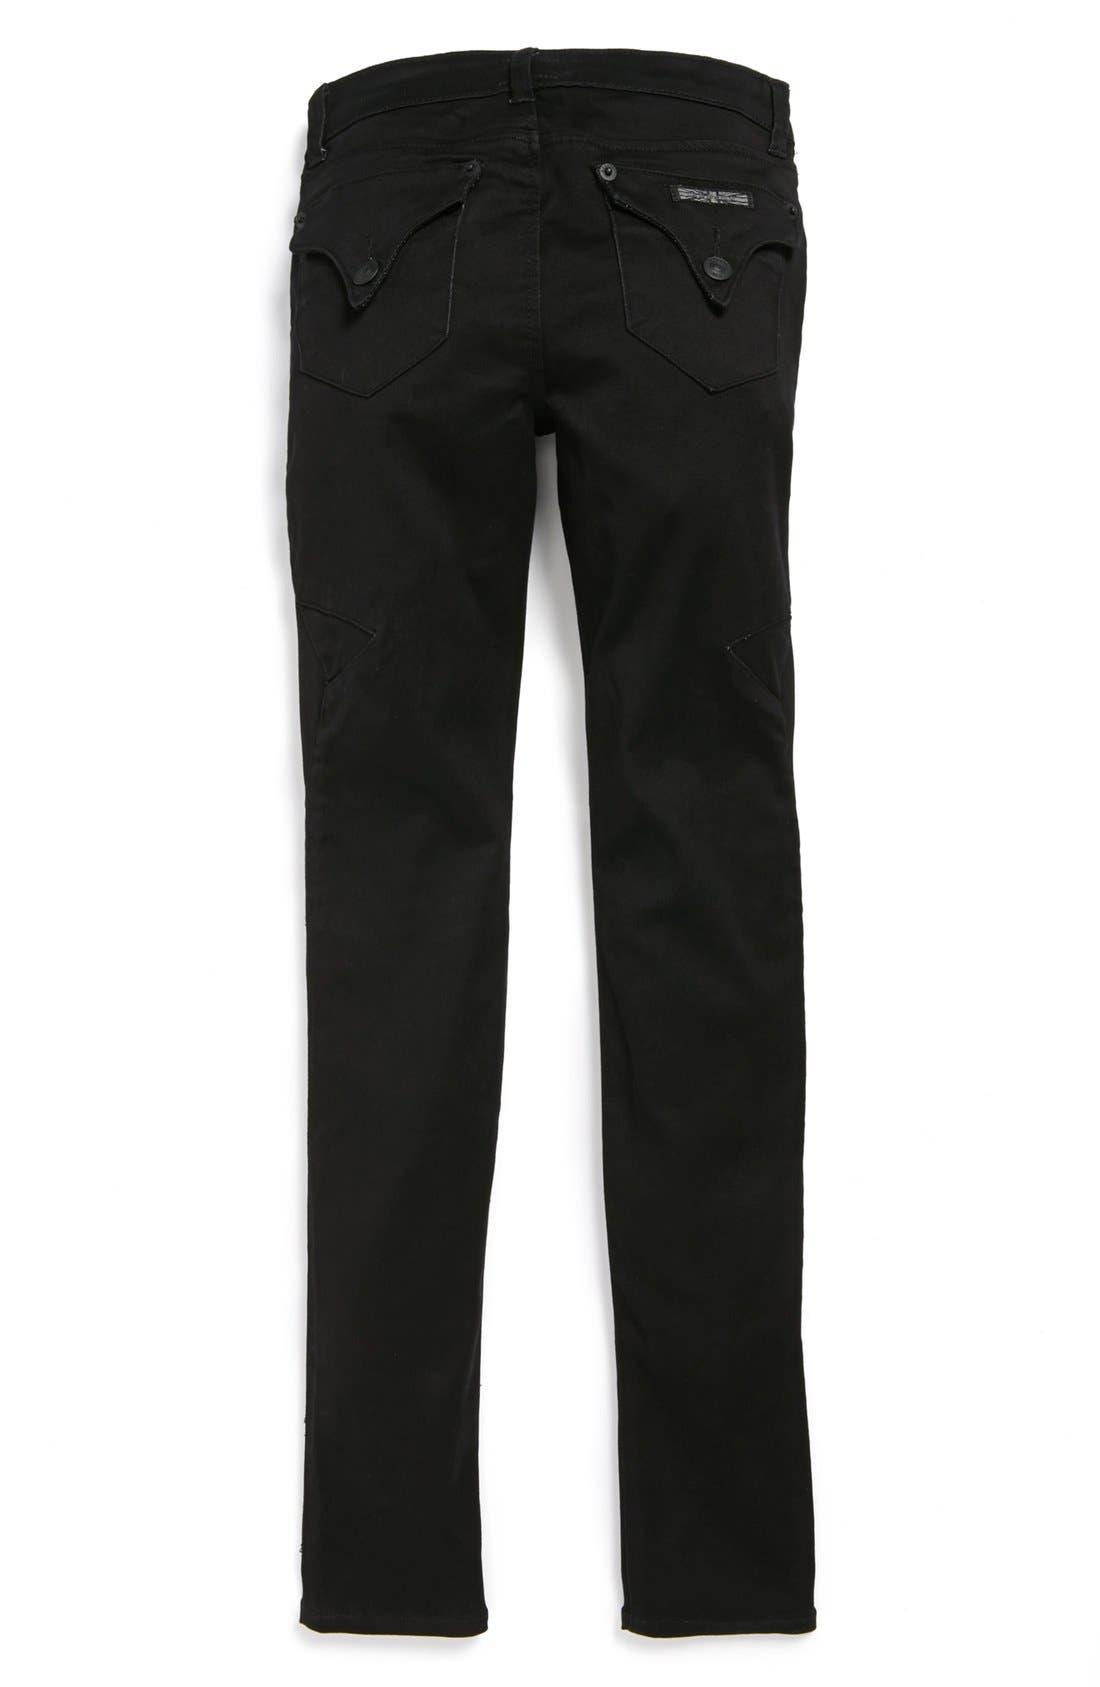 Alternate Image 1 Selected - Hudson Kids 'Moto' Skinny Jeans (Big Girls)